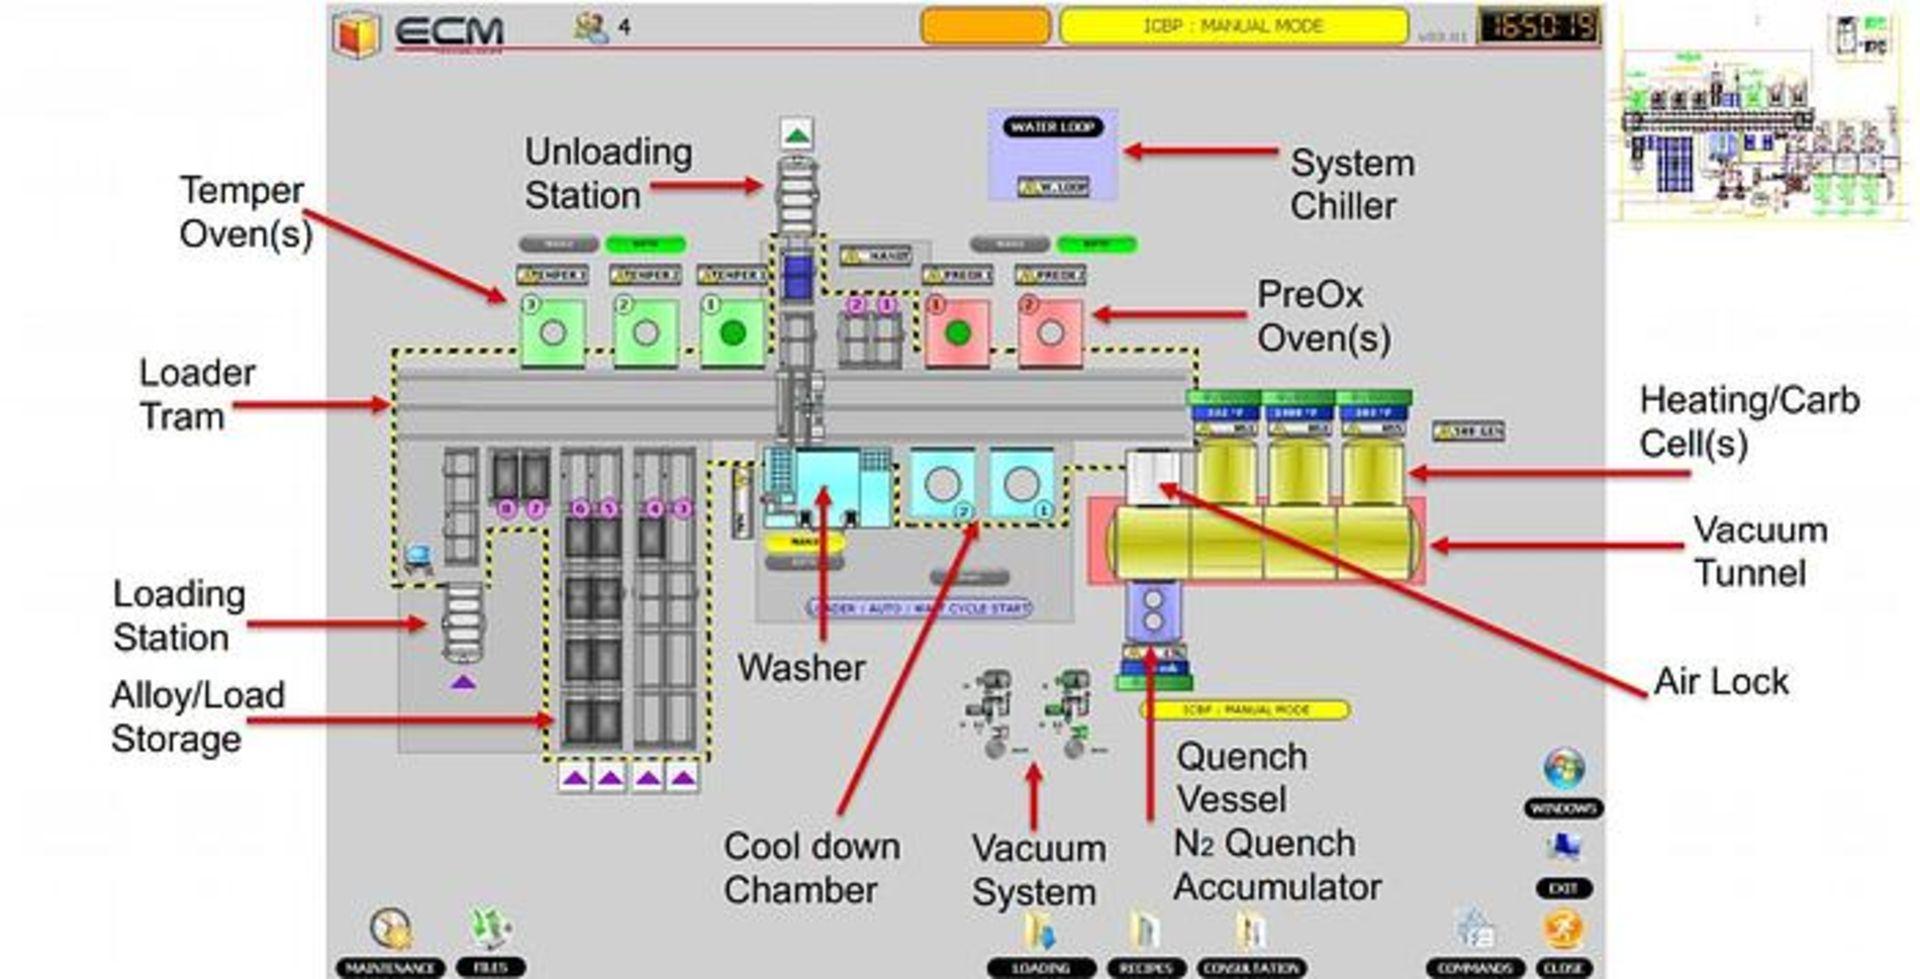 ECM TECHNOLOGIES VACUM CARBURIZING FURNACE, NEW 2013, SN 3100-500 - Image 13 of 50